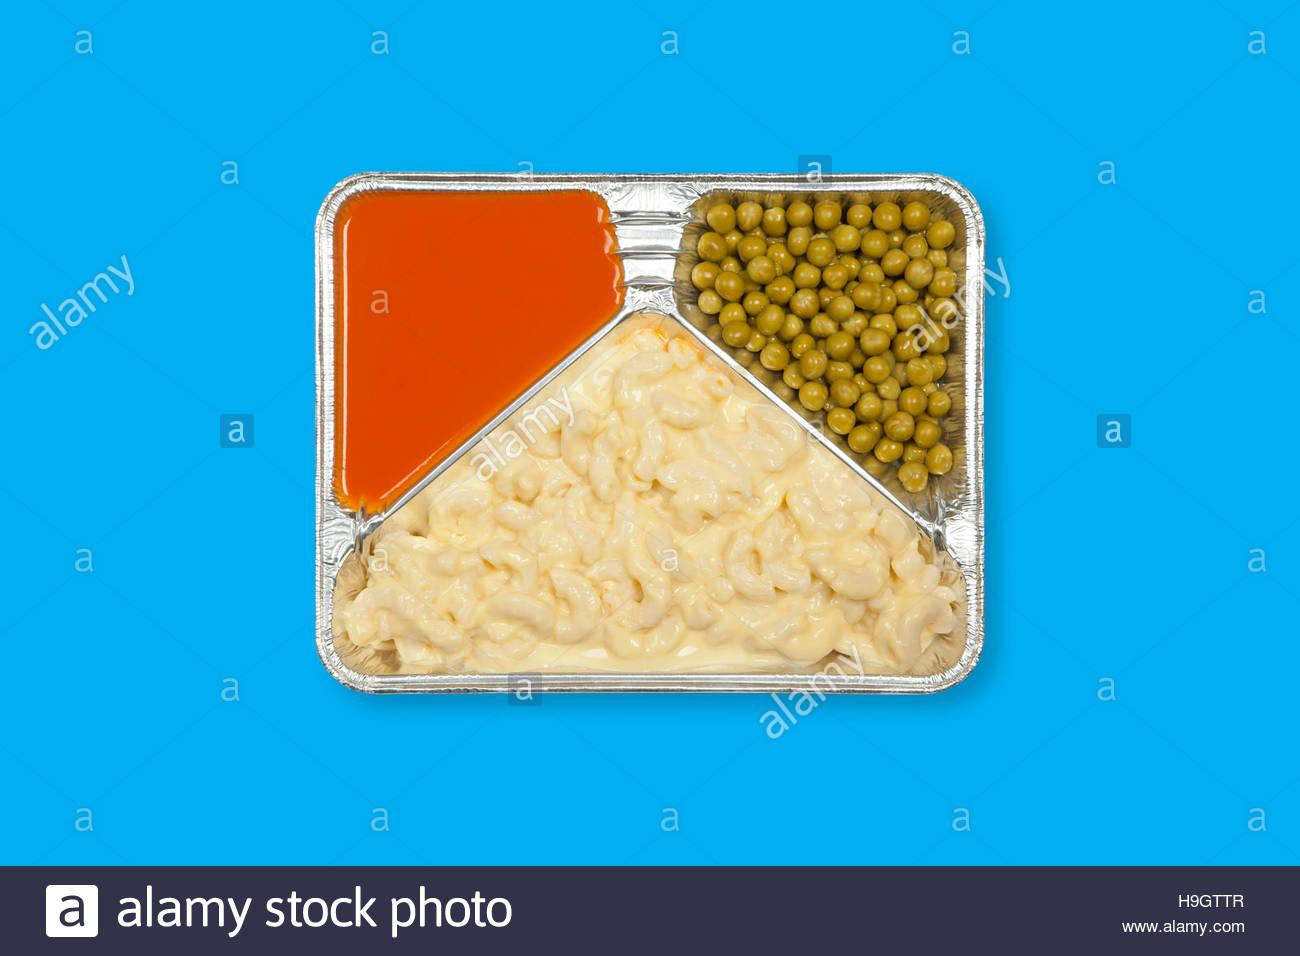 TV dinner tray vintage retro meal aluminum food dish on plain background Stock Photo